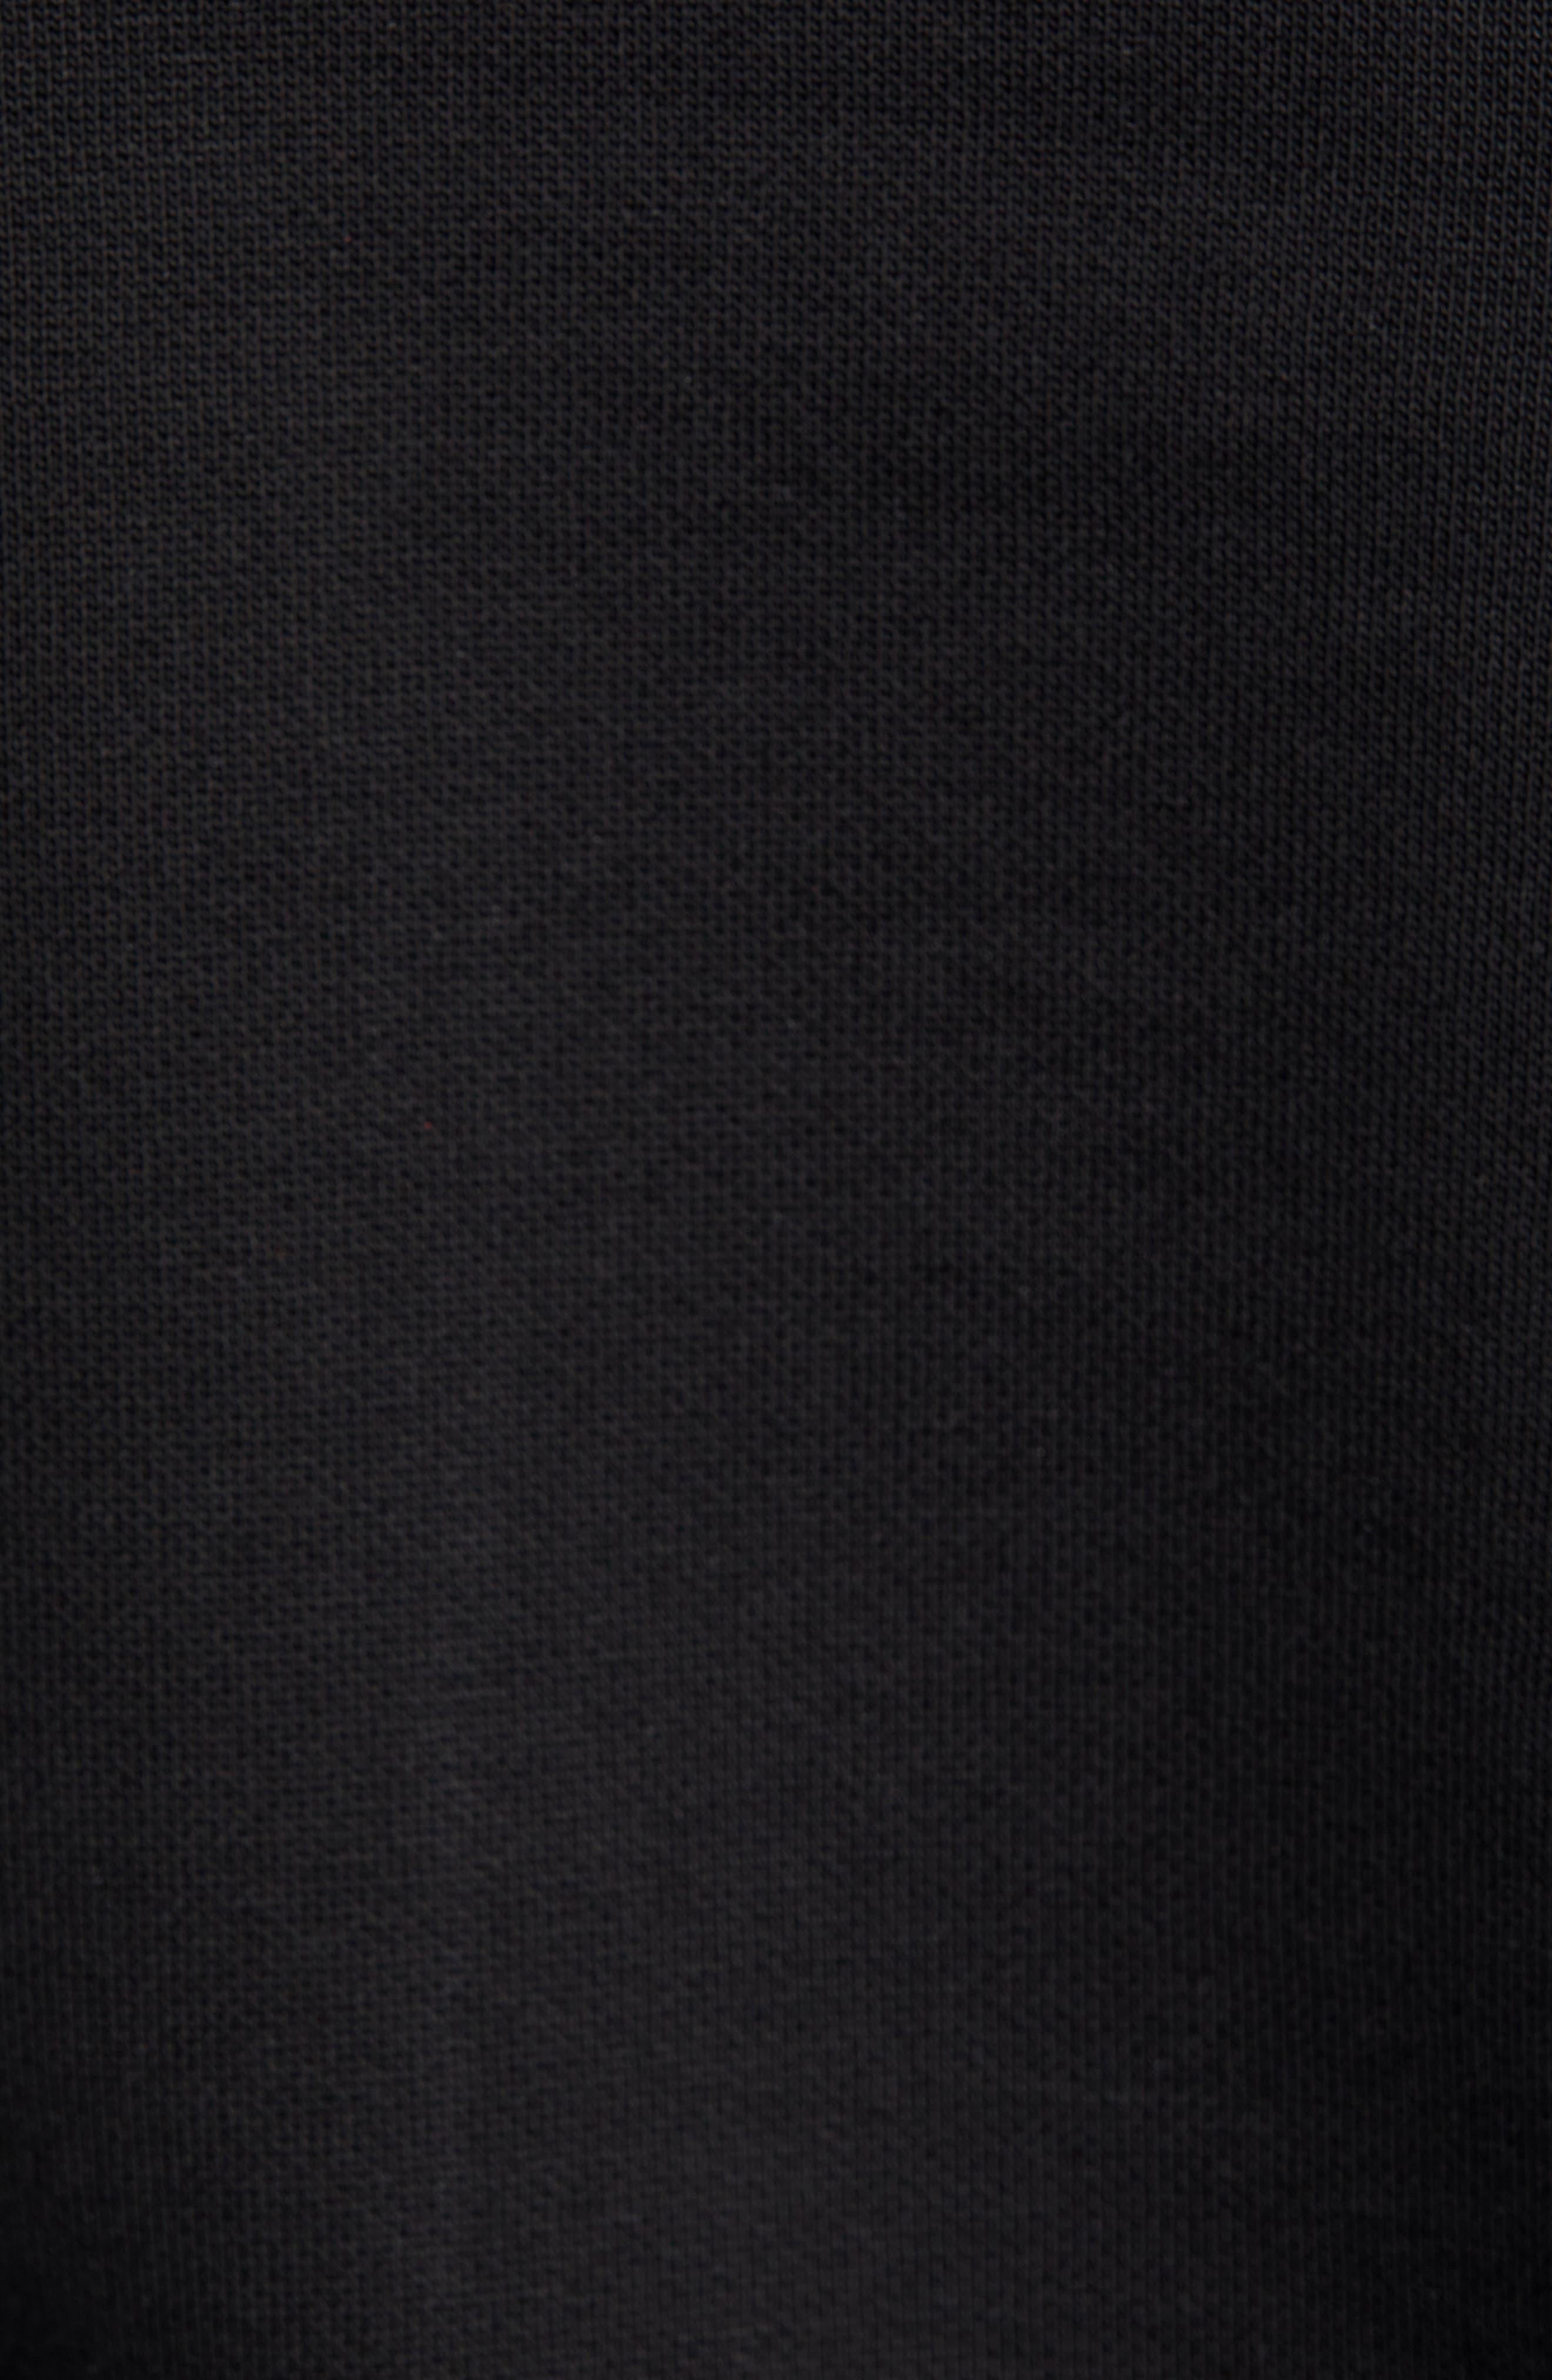 Logo Embroidered Hooded Sweatshirt,                             Alternate thumbnail 5, color,                             BLACK / WHITE